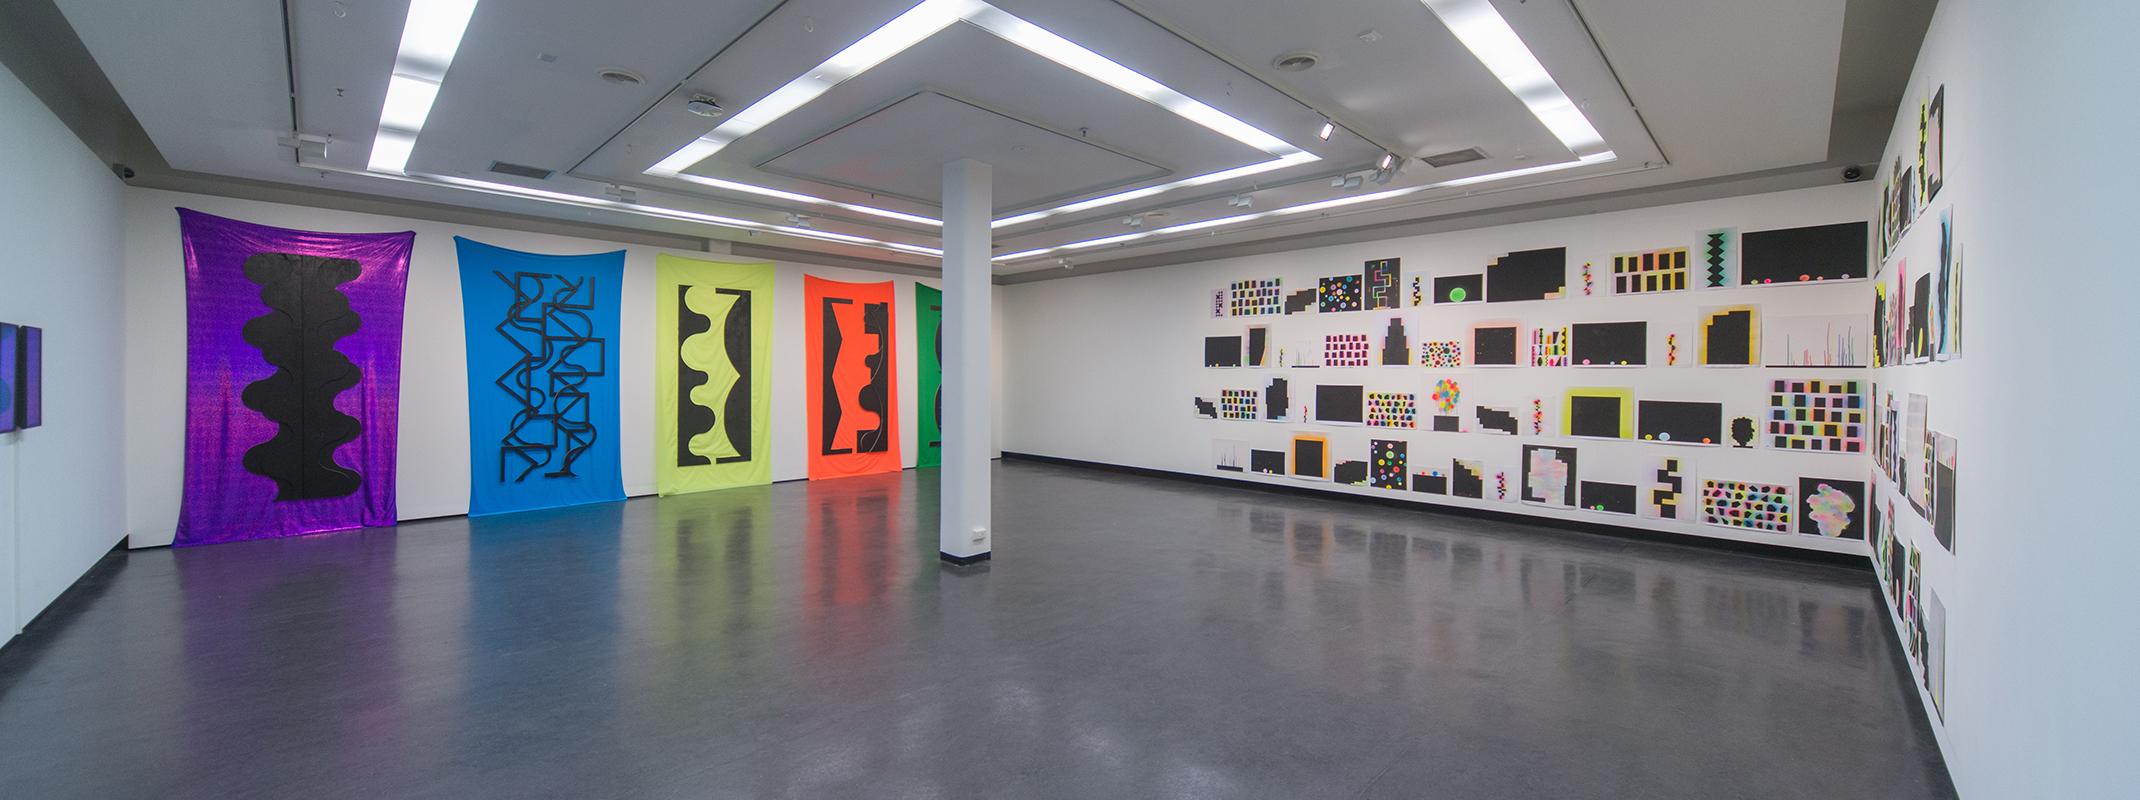 David Batchelor,  Psychogeometry 2 , 2018, installation view